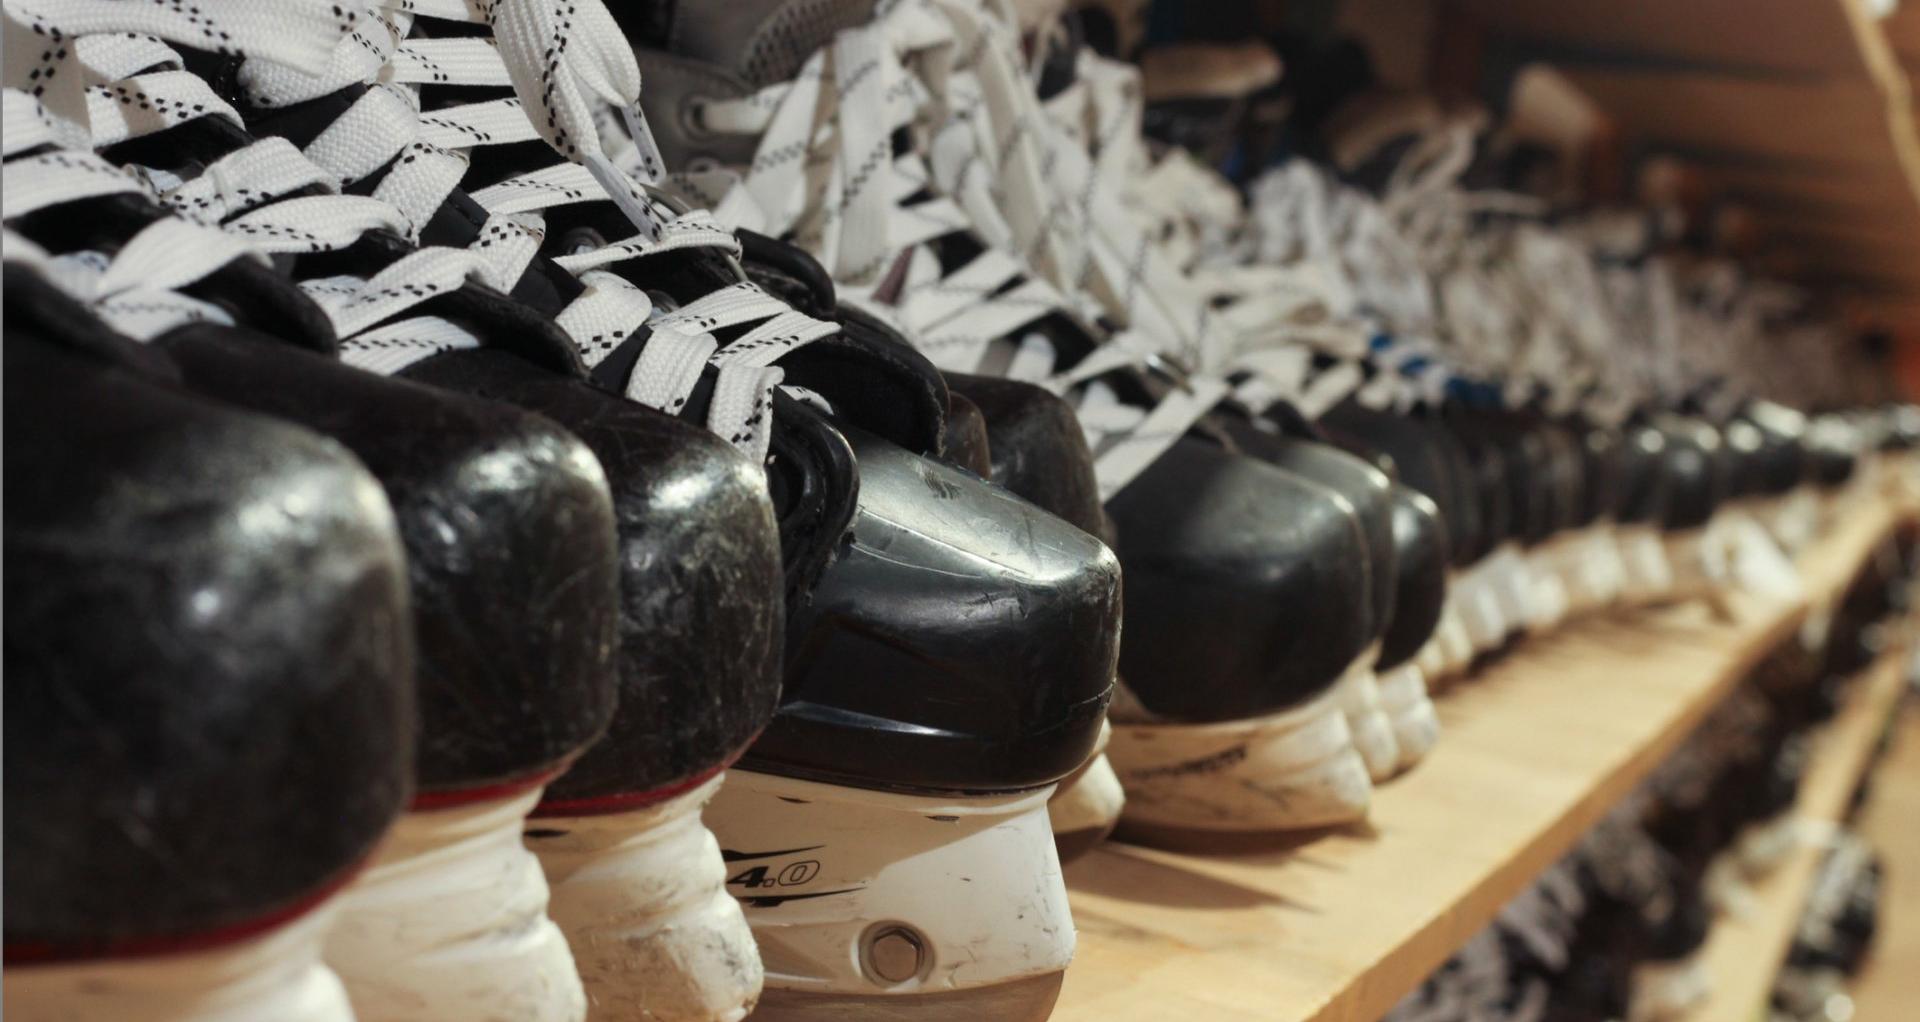 New Skates | Reconditioned Skates | Grand Forks, ND